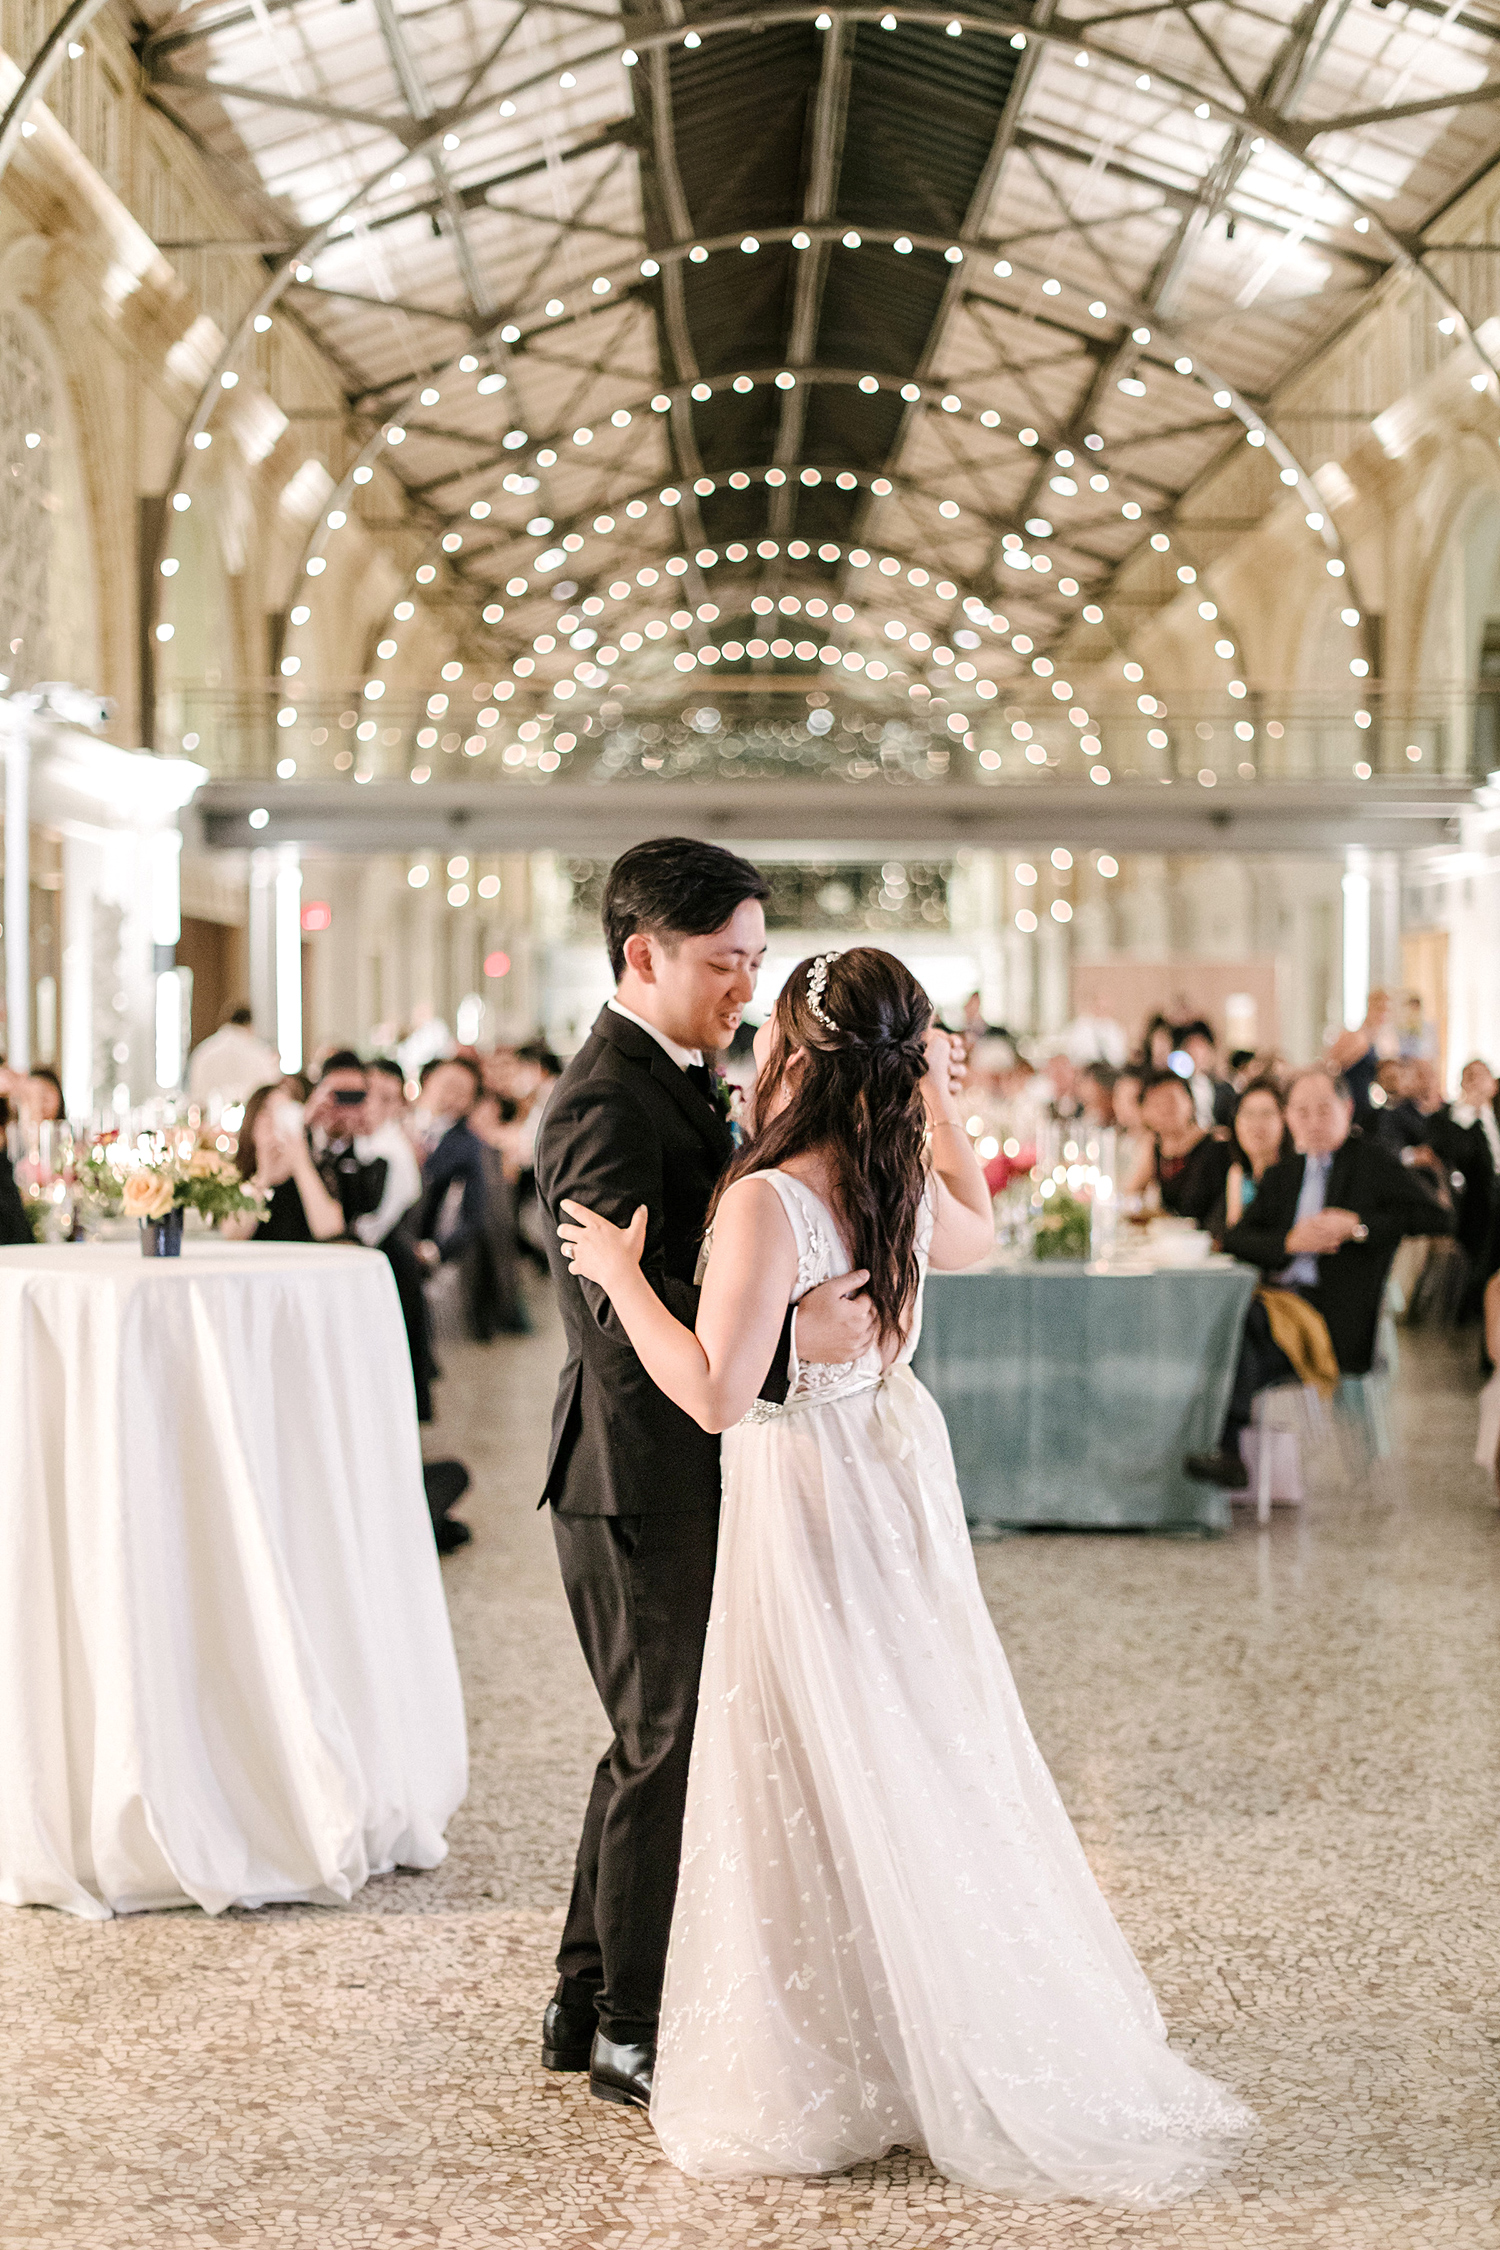 stephanie tim wedding first dance